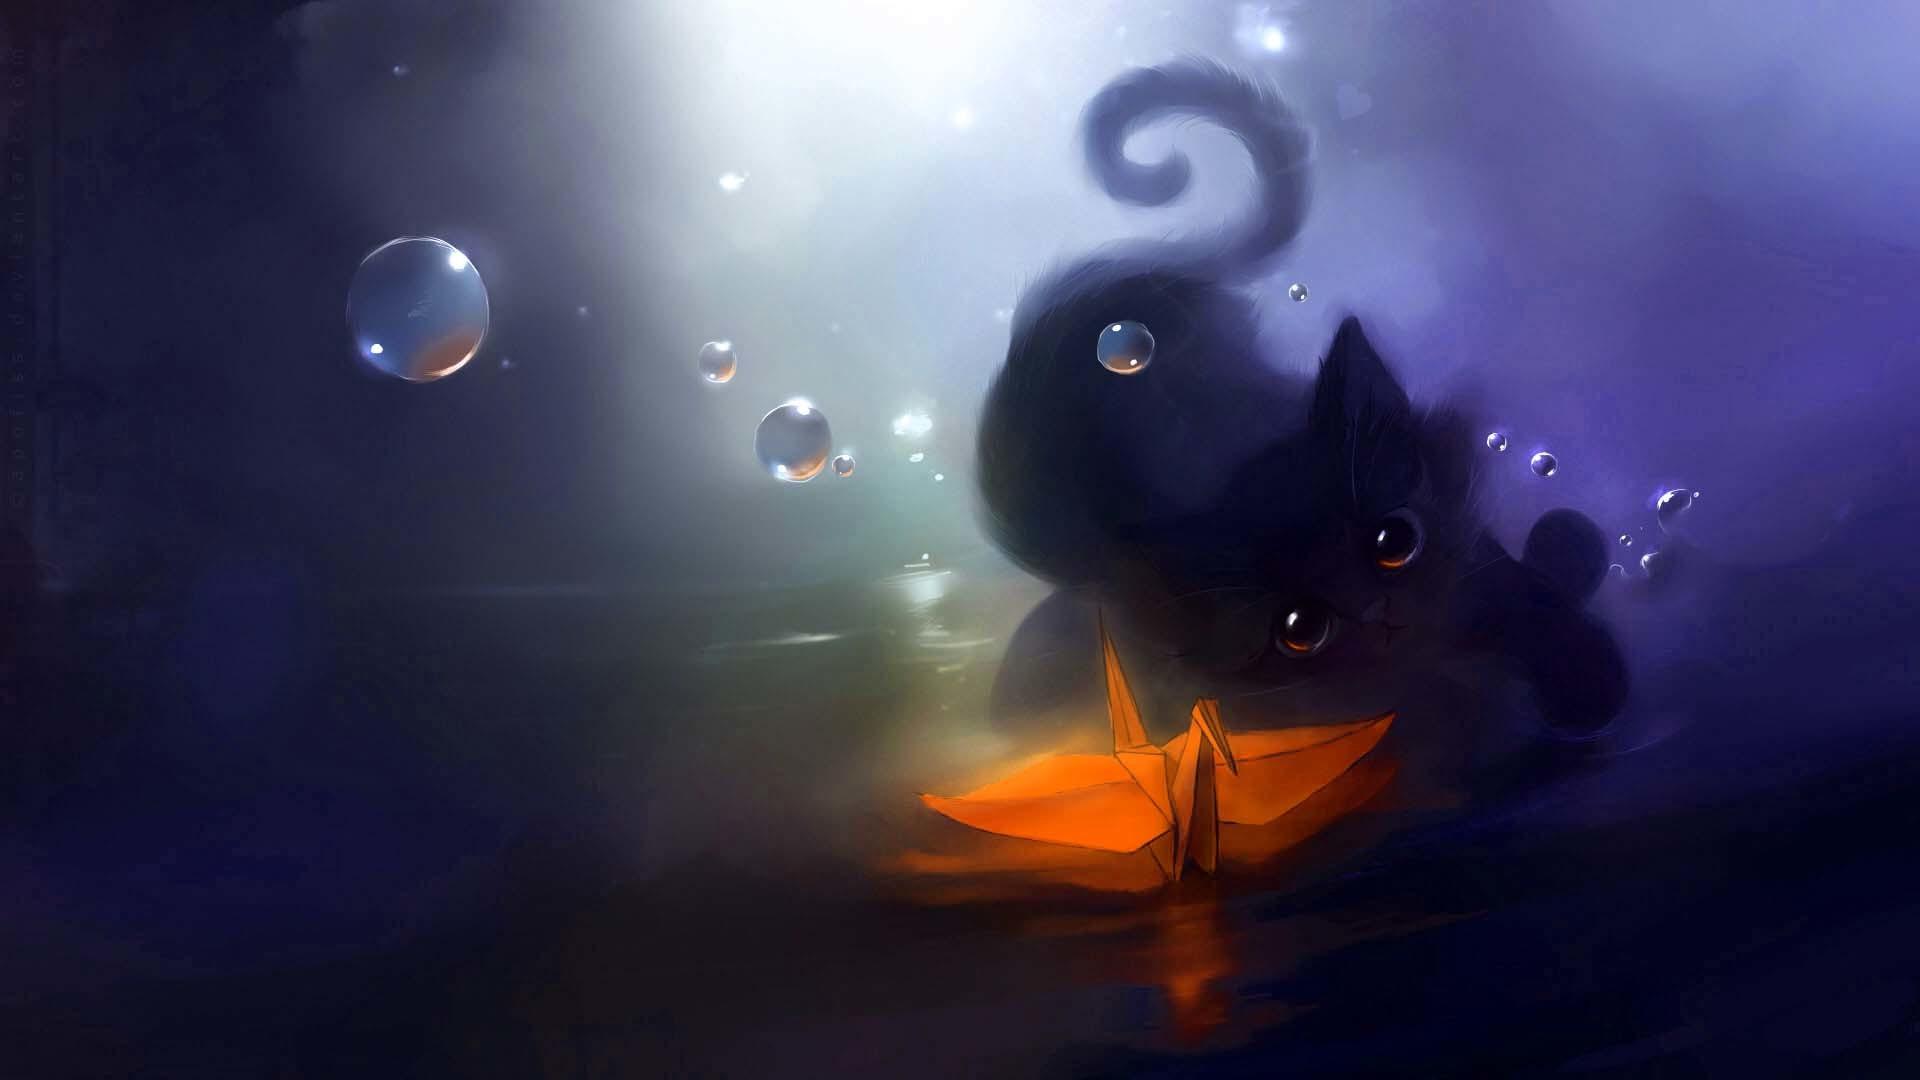 Cute Anime Cat Wallpaper Cat Backgrounds 1920x1080 Wallpaper Teahub Io